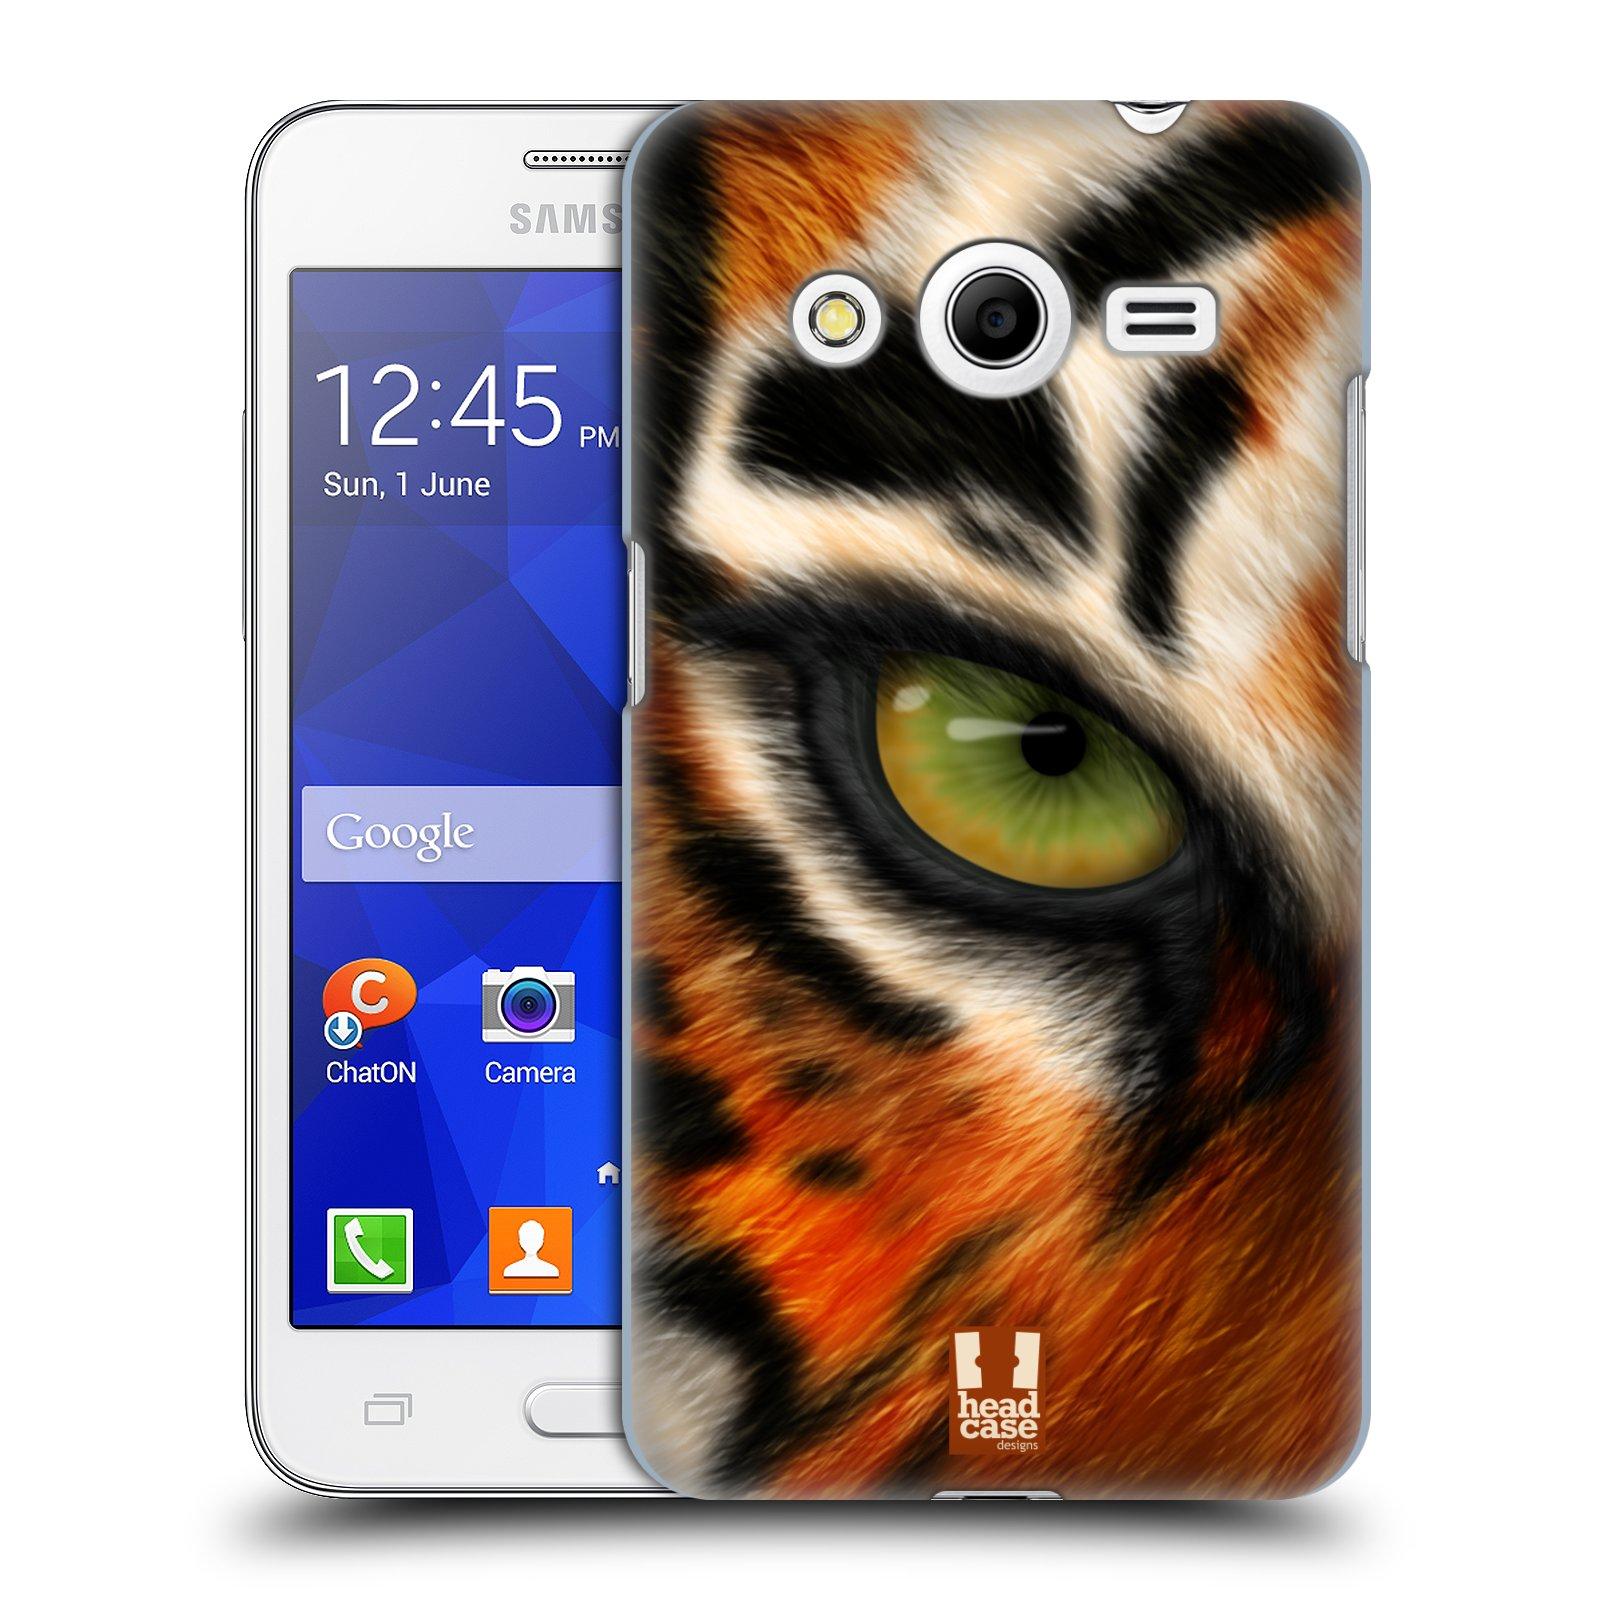 HEAD CASE plastový obal na mobil SAMSUNG GALAXY Core 2 (G355H) vzor pohled zvířete oko tygr